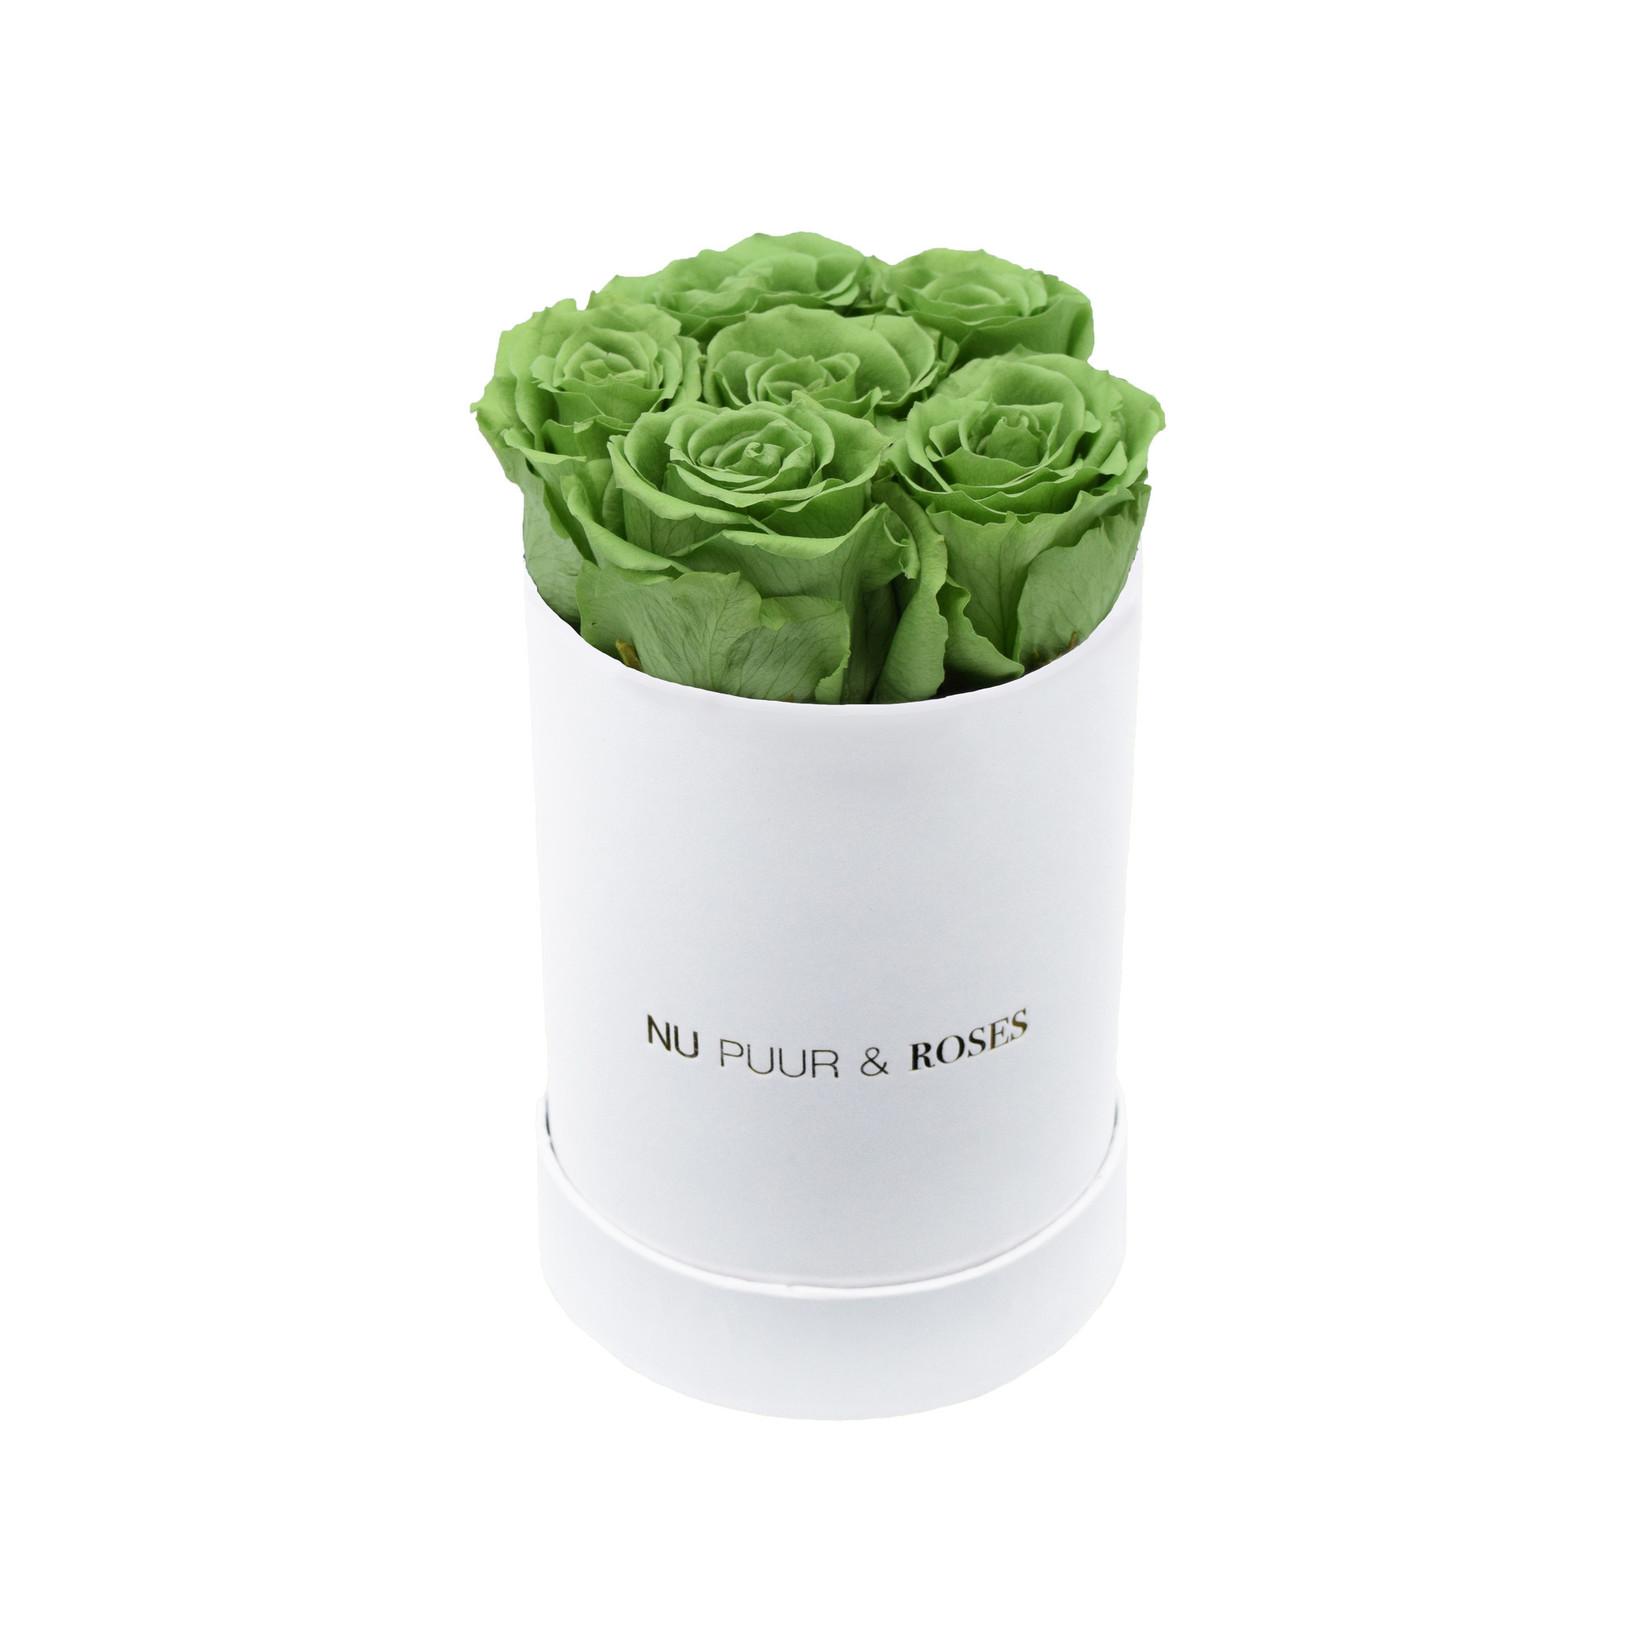 Mini - Green Endless Roses - White Box